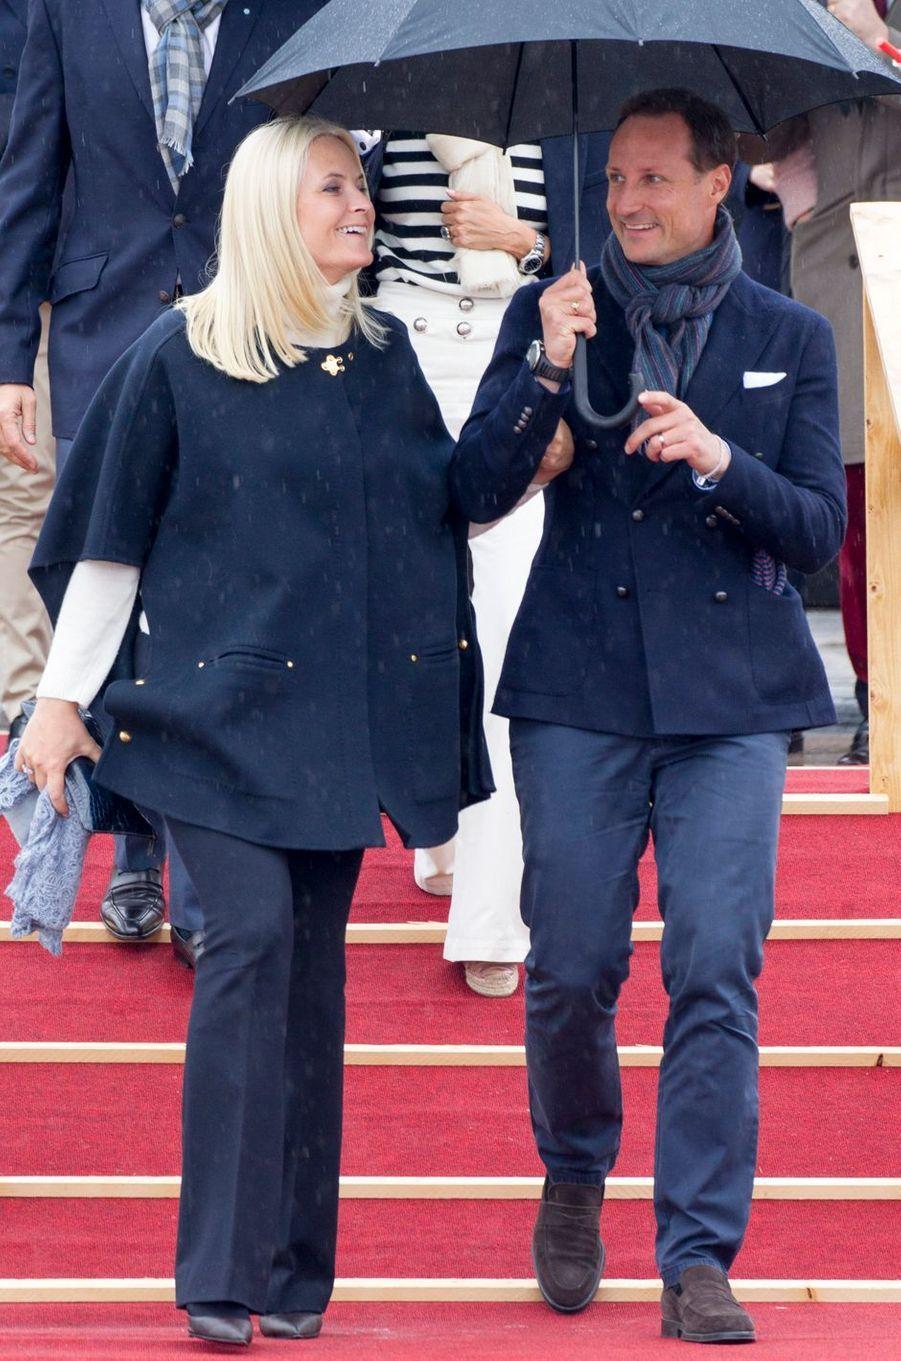 La princesse Mette-Marit et le prince Haakon de Norvège à Oslo, le 10 mai 2017